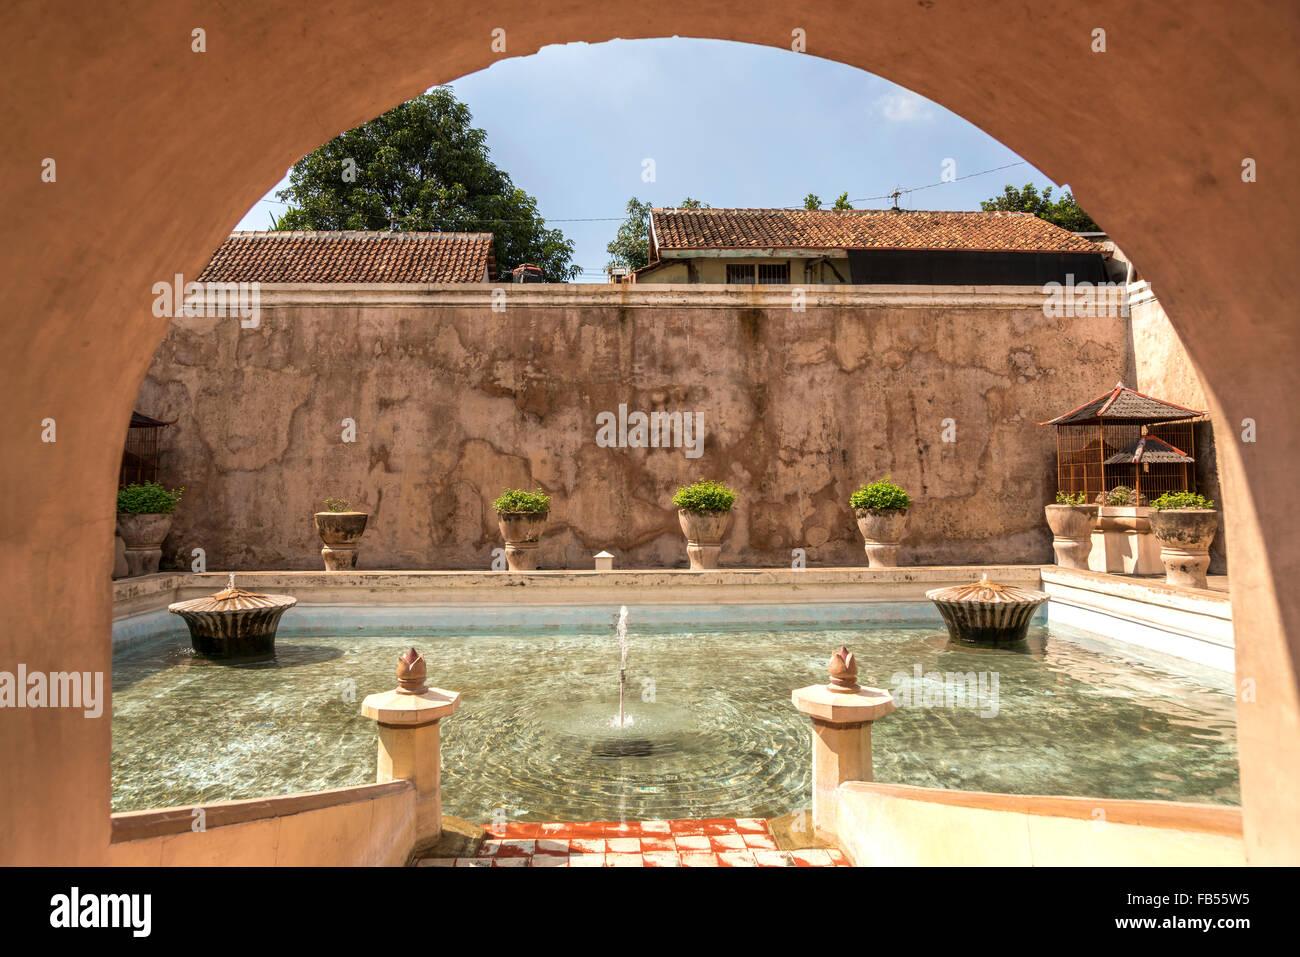 Water palace Taman Sari in Yogyakarta, Java, Indonesia, Asia - Stock Image